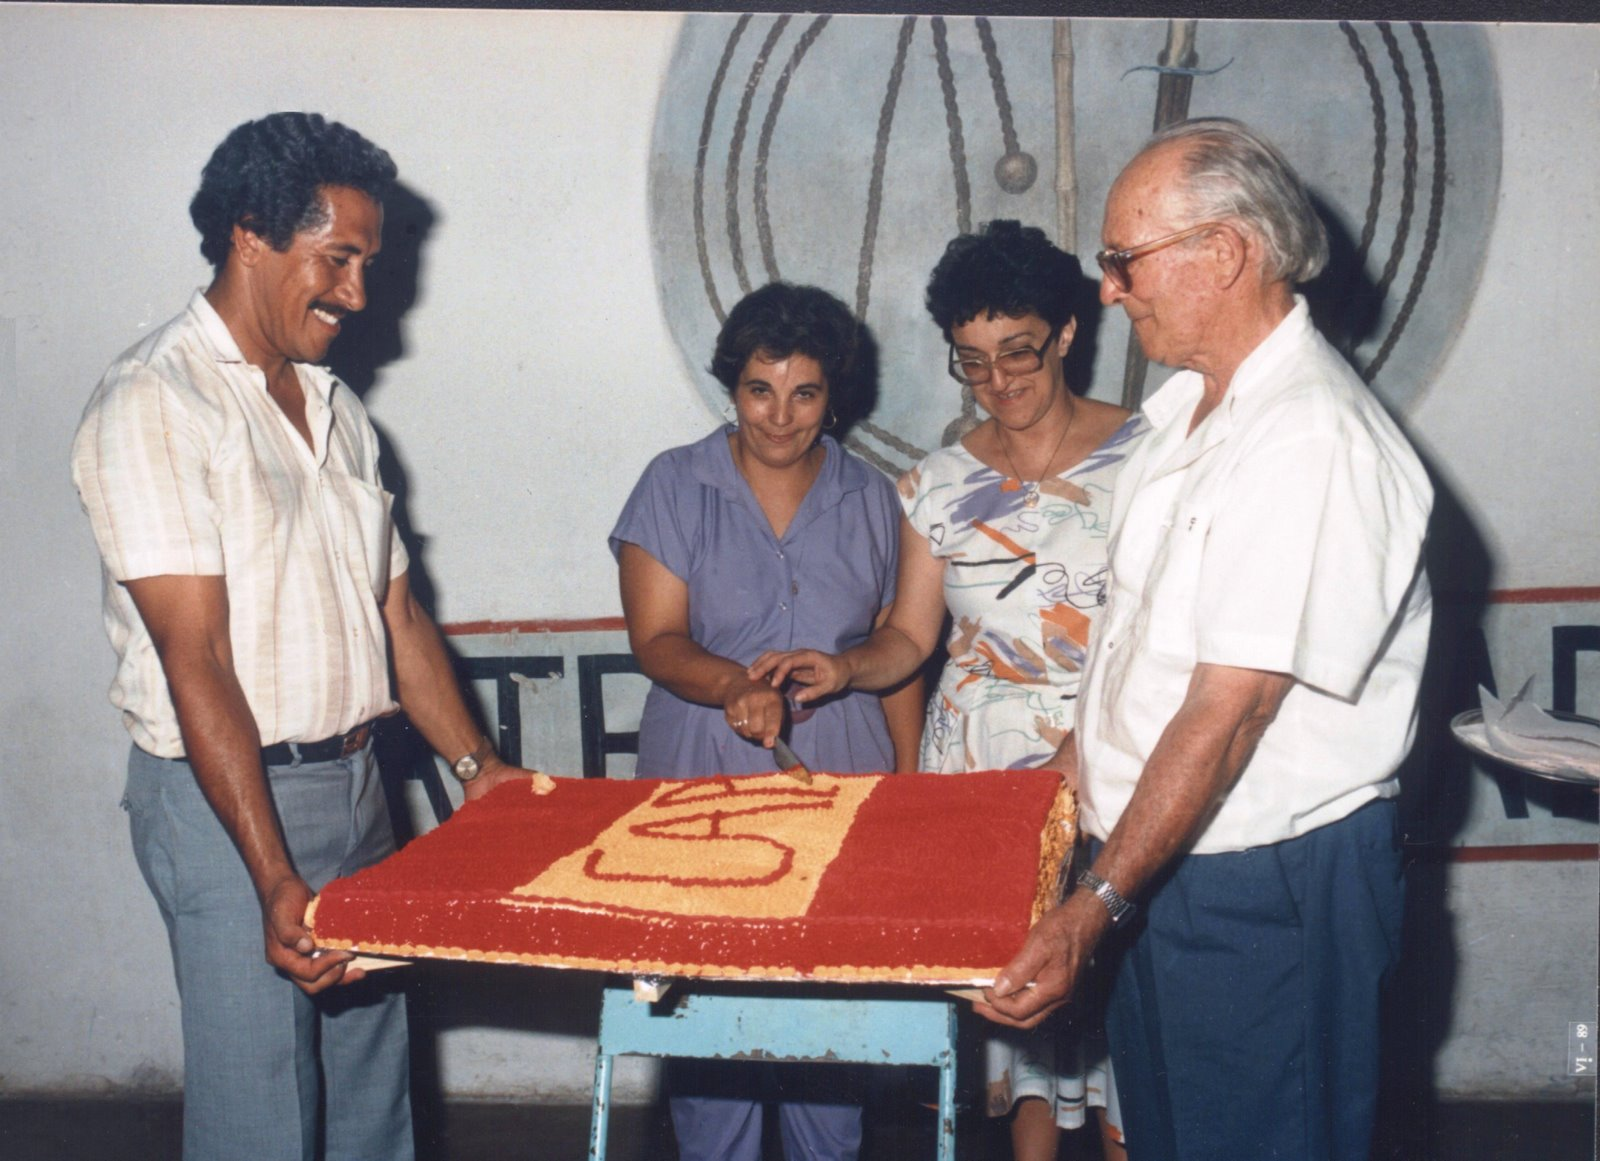 AÑO 1990 CLEMENTINO ALBERNAZ